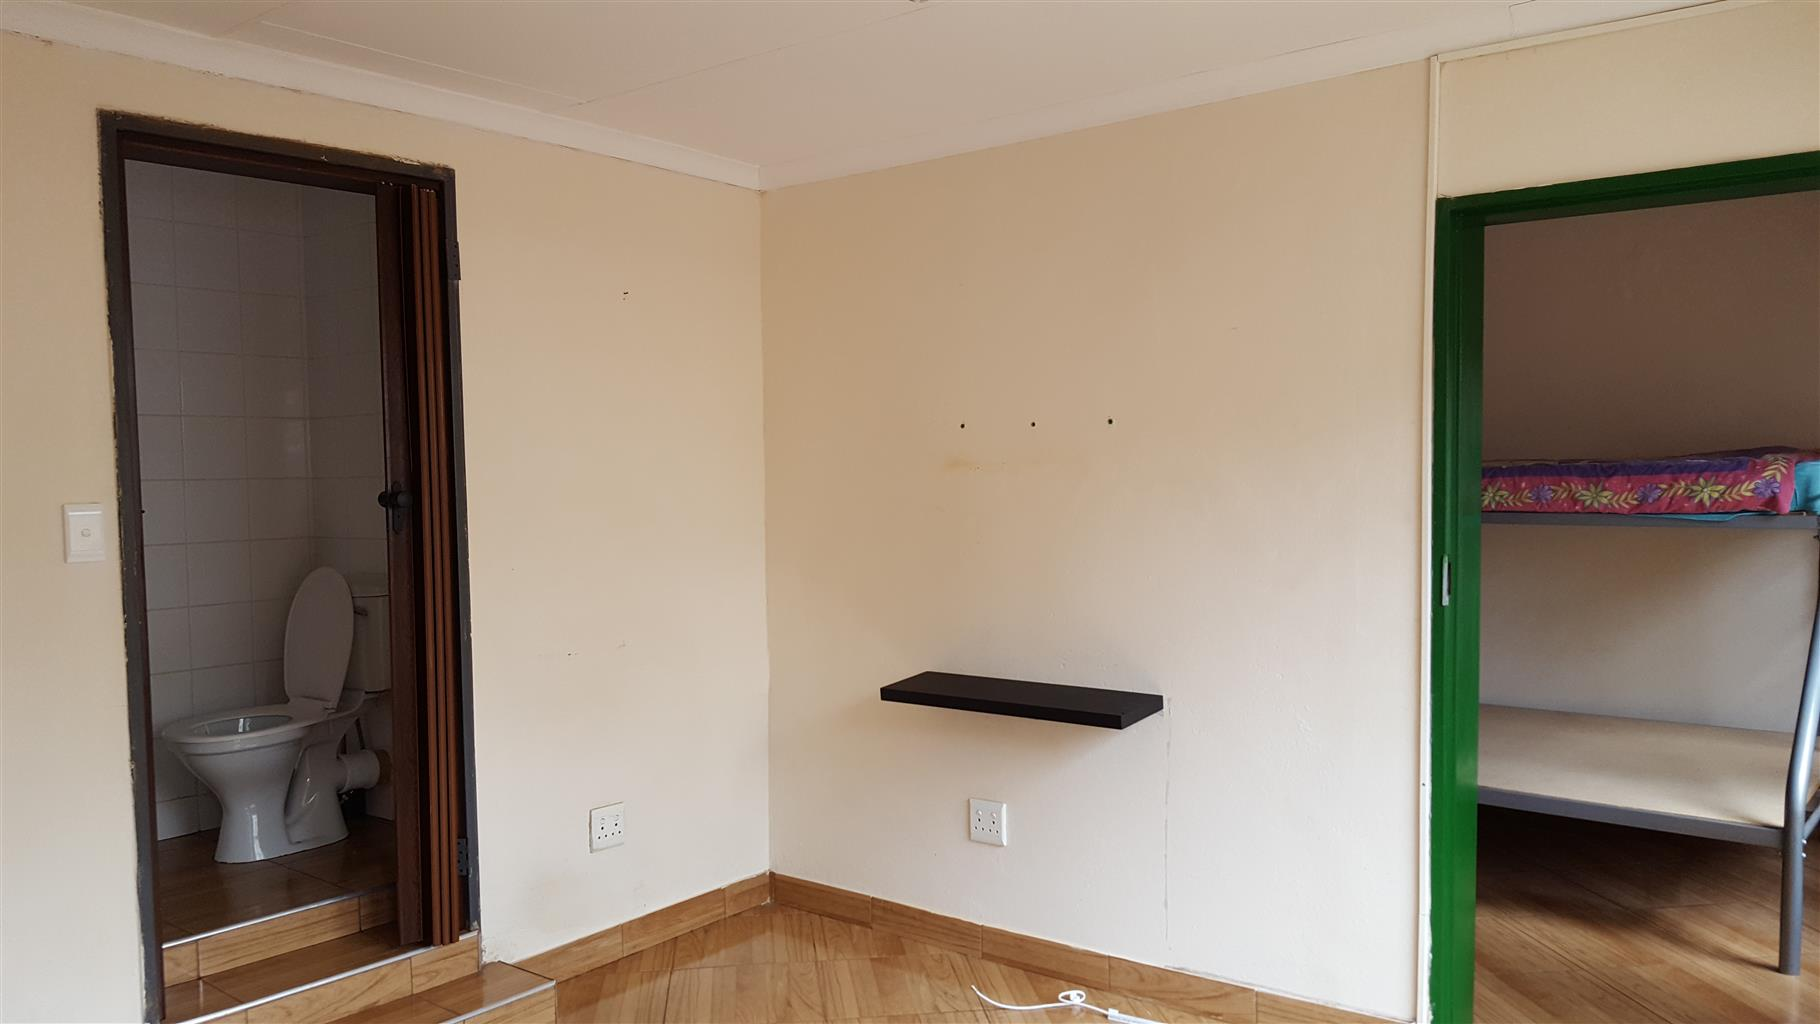 Bachelor open plan flat for hire Deposit R3500